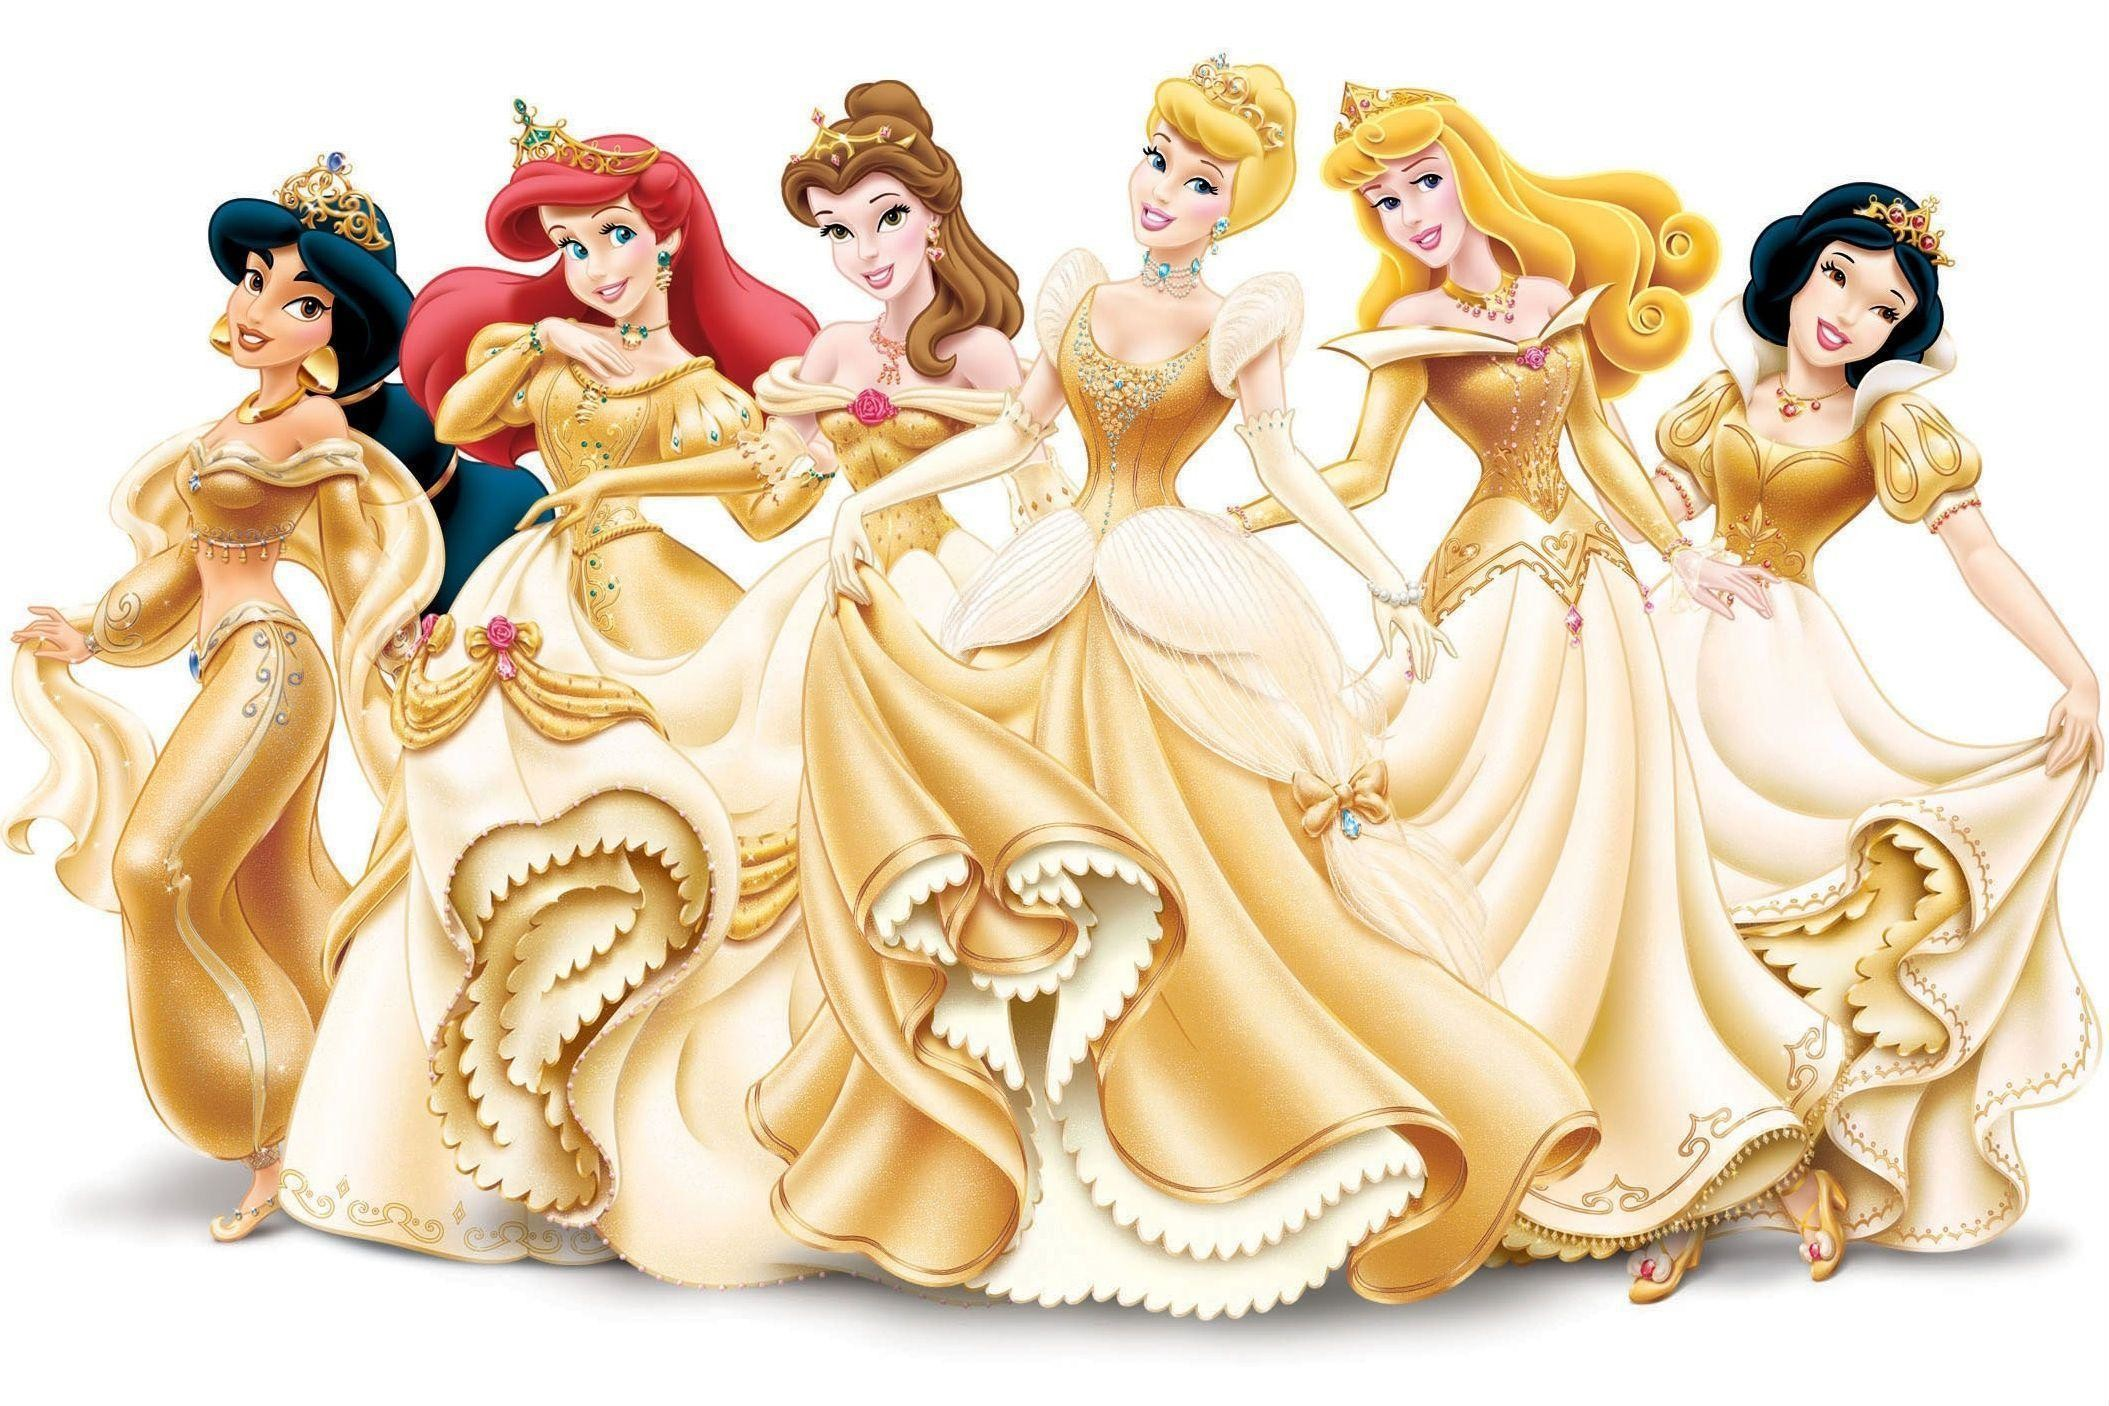 1920x1200 Disney Princess HD Wallpapers THIS Wallpaper